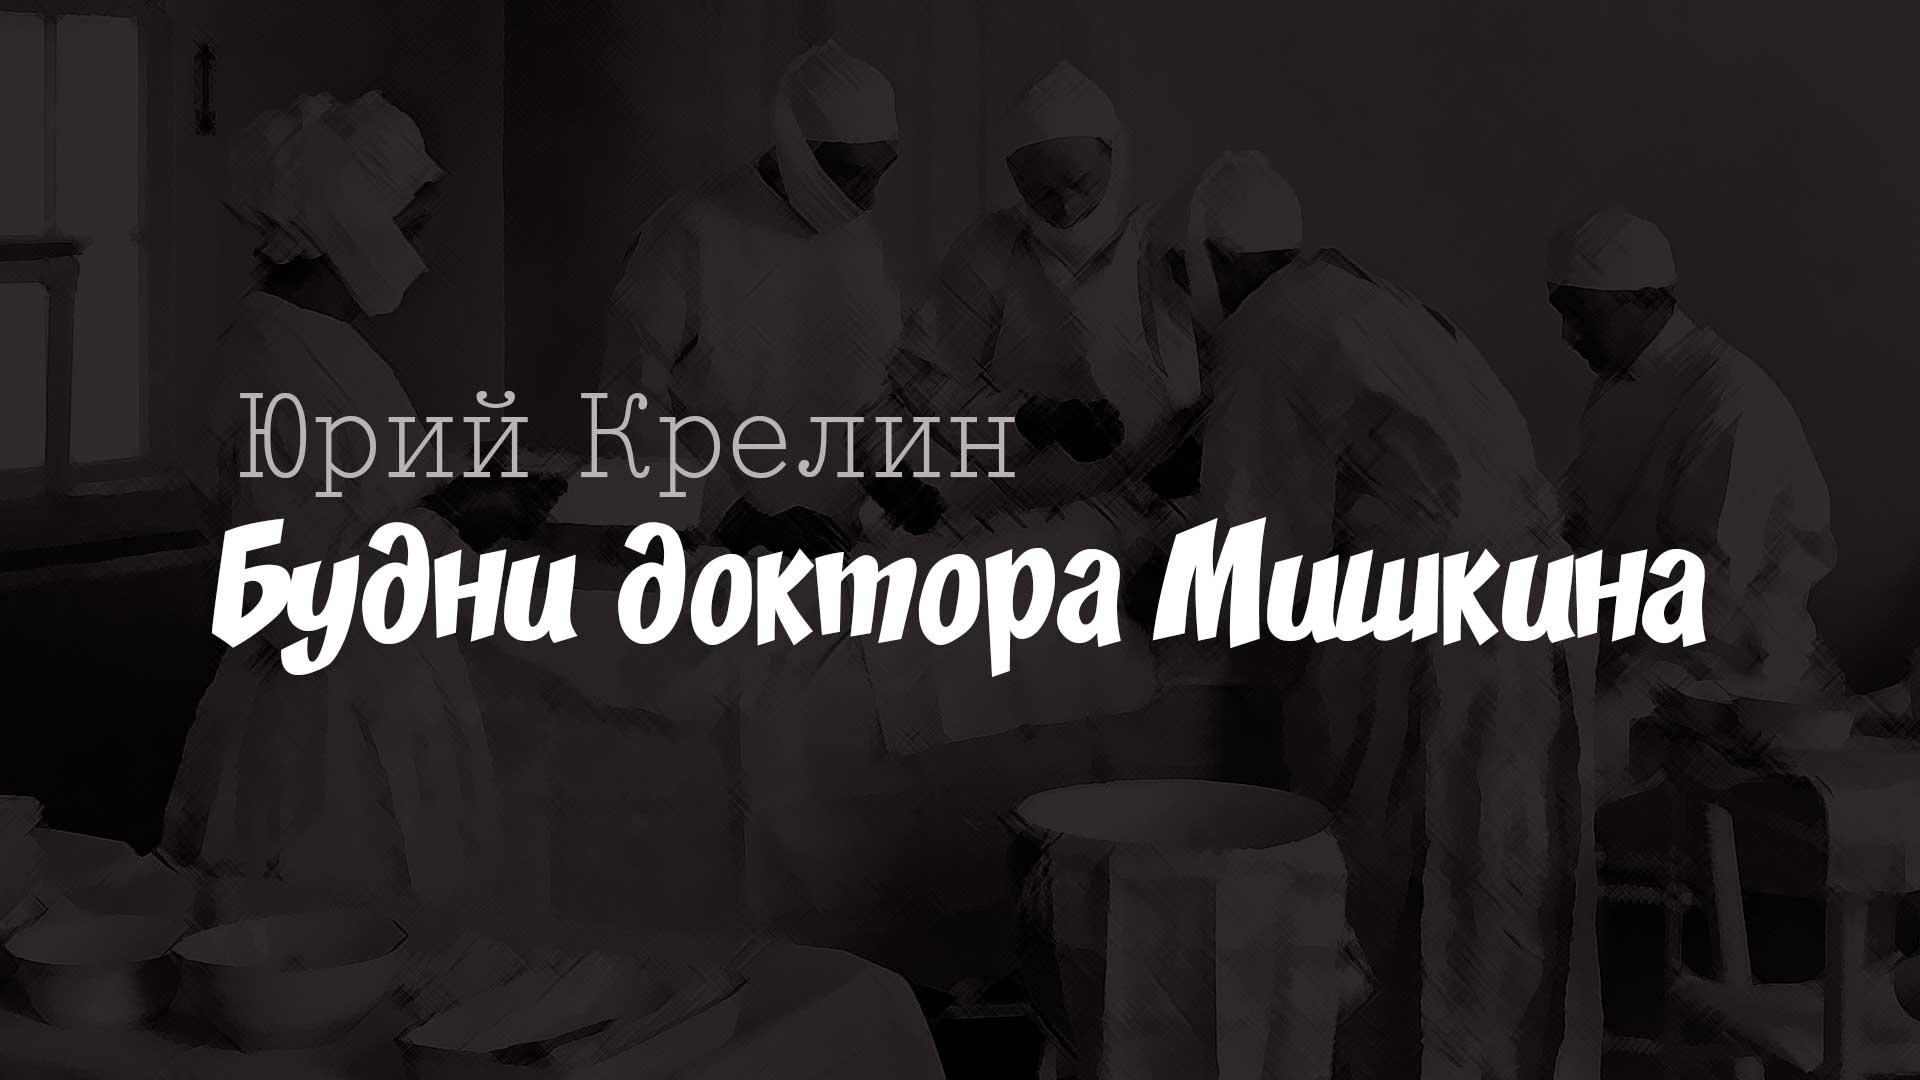 Юрий Крелин. Будни доктора Мишкина